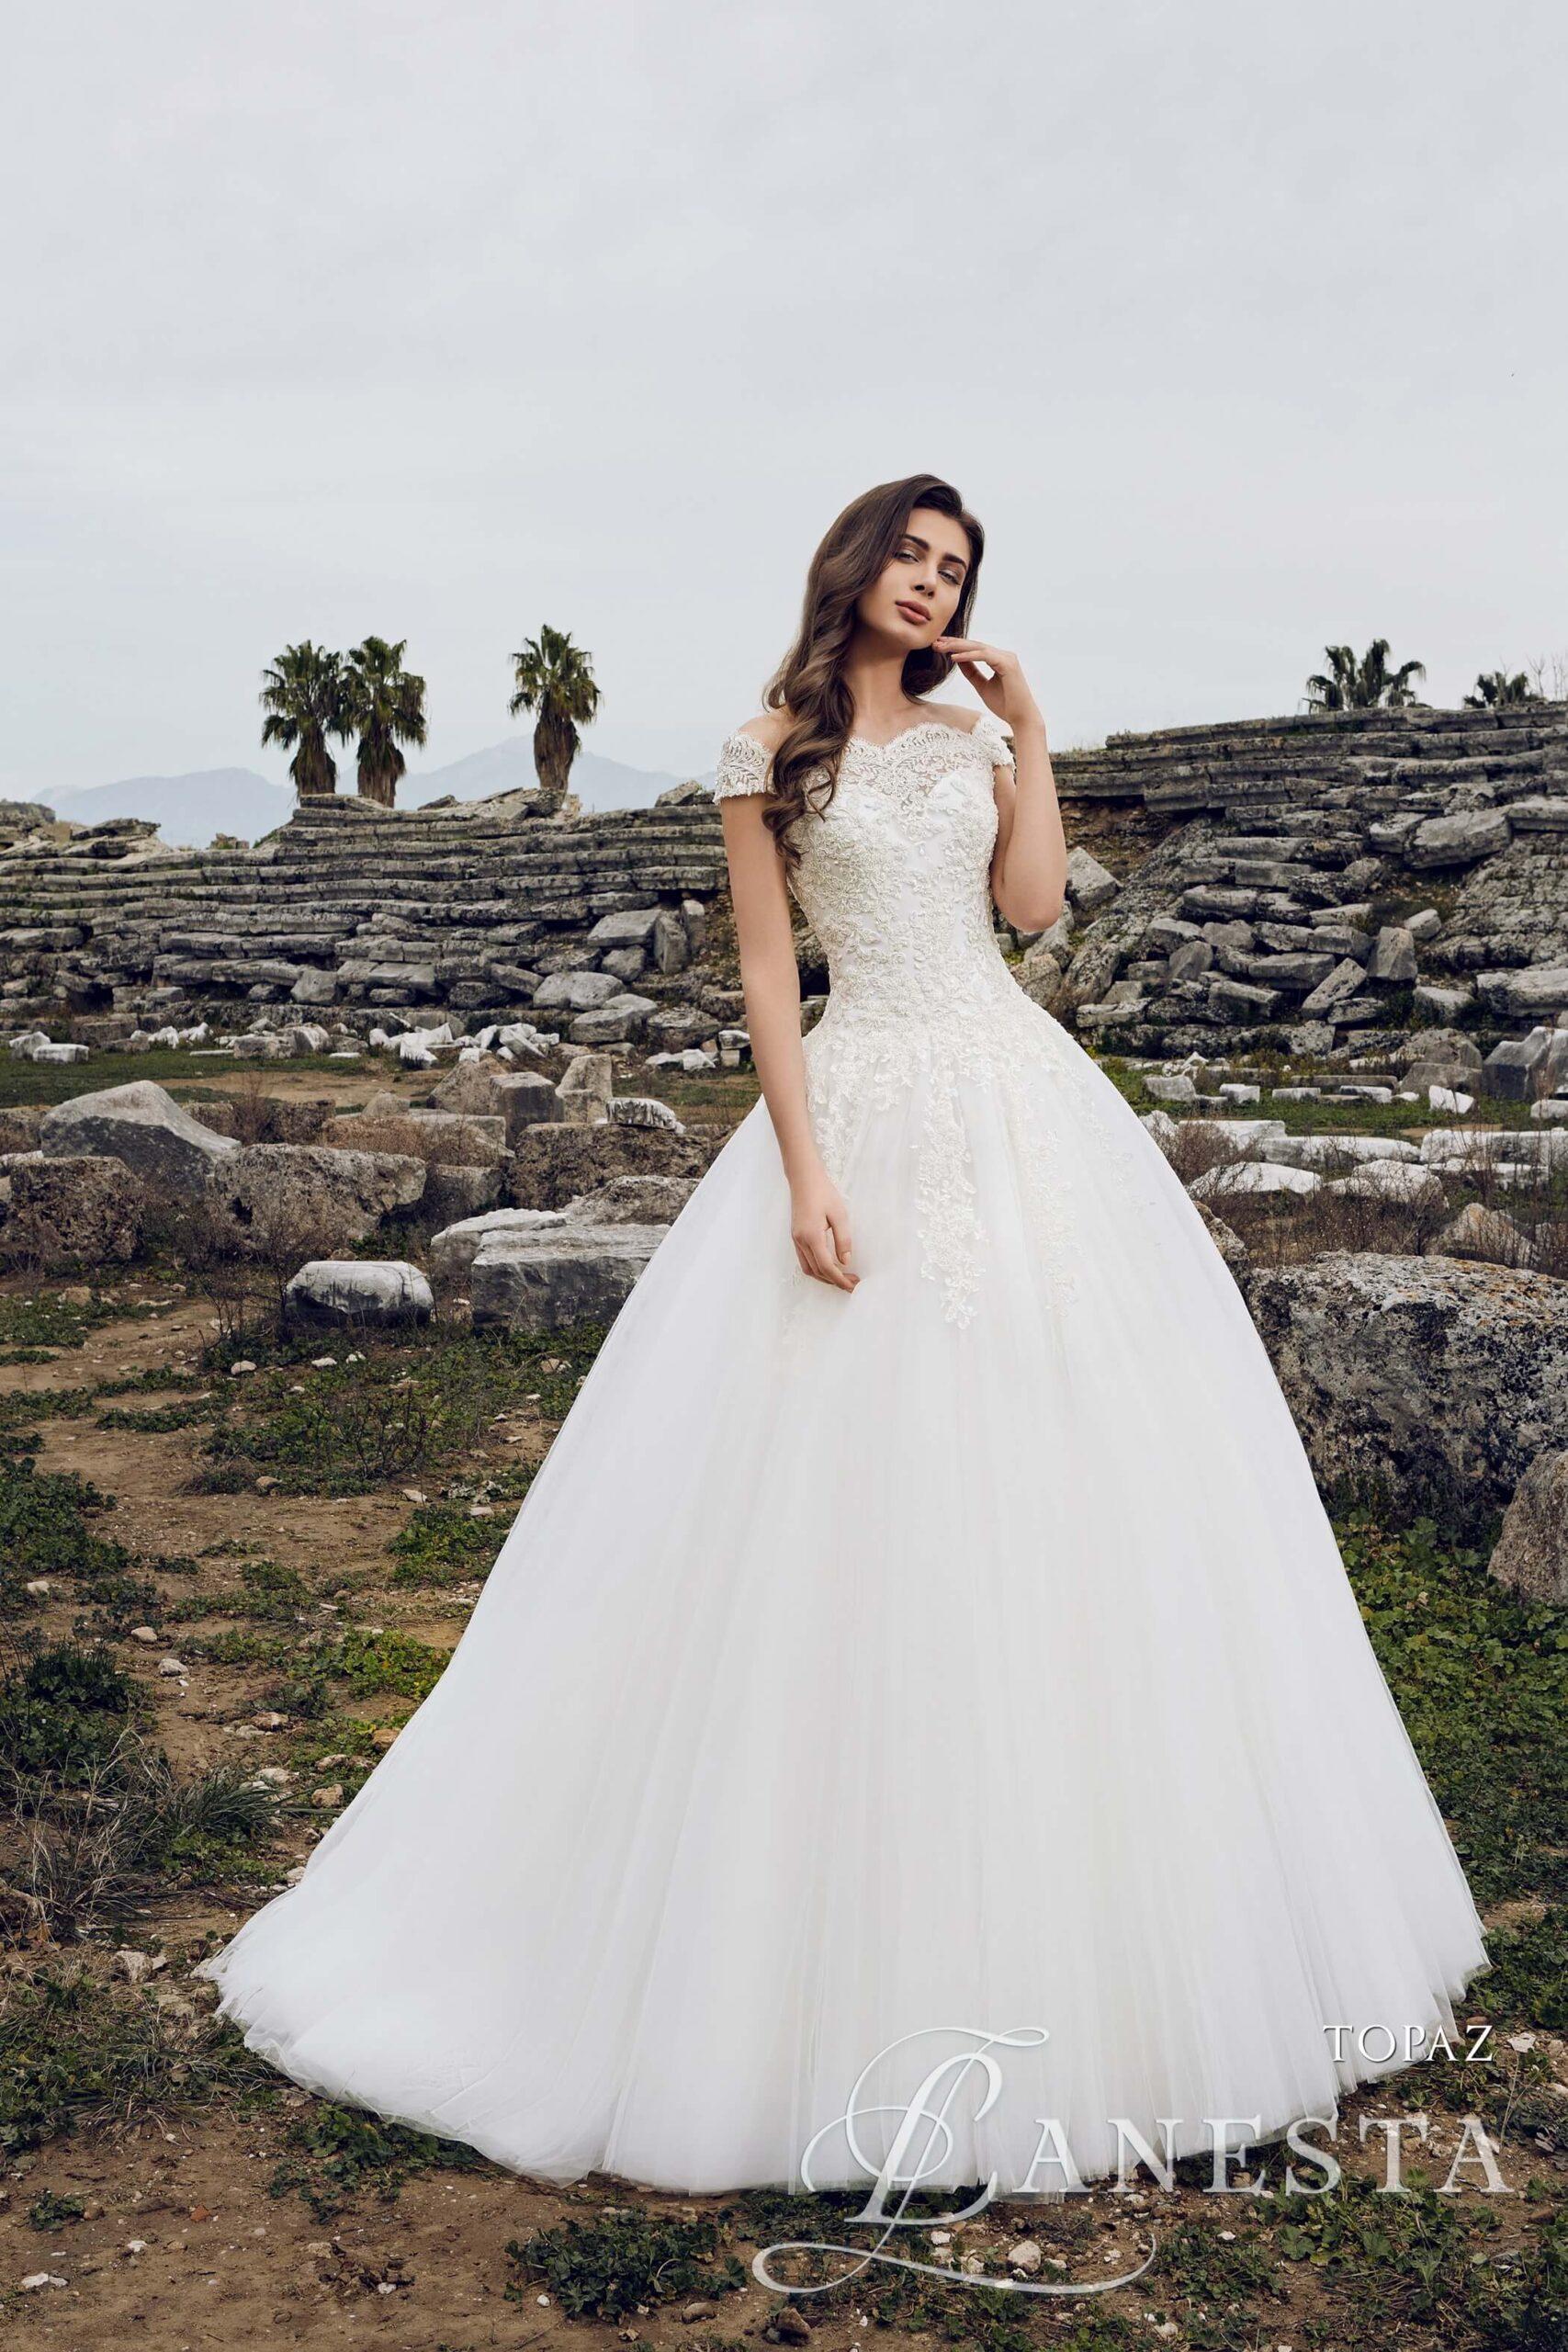 Весільна сукня Topaz Lanesta